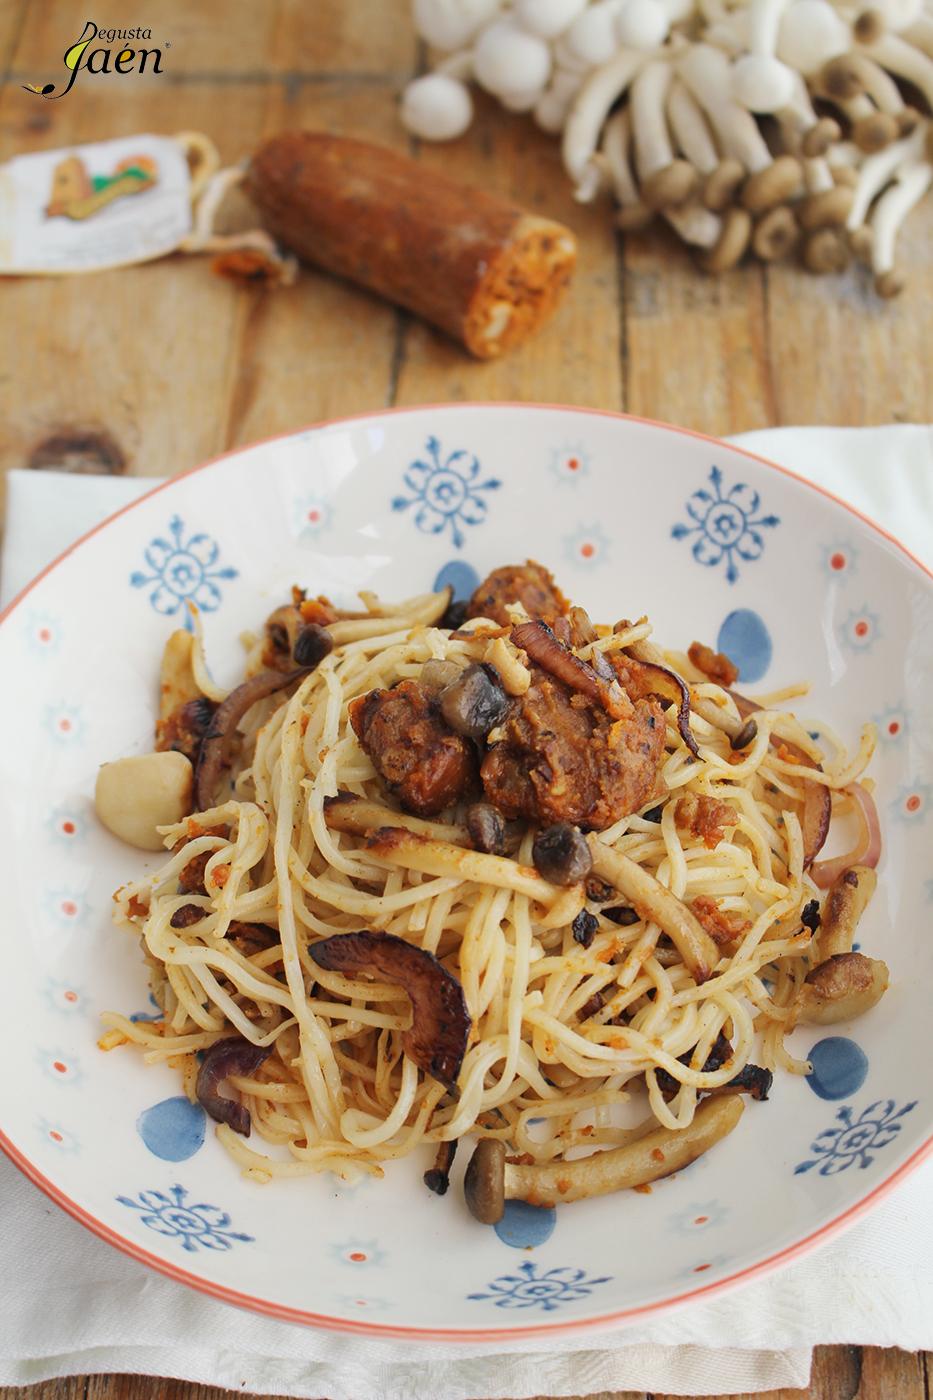 Fideos chinos morcilla sin sangre Degusta Jaen (2)